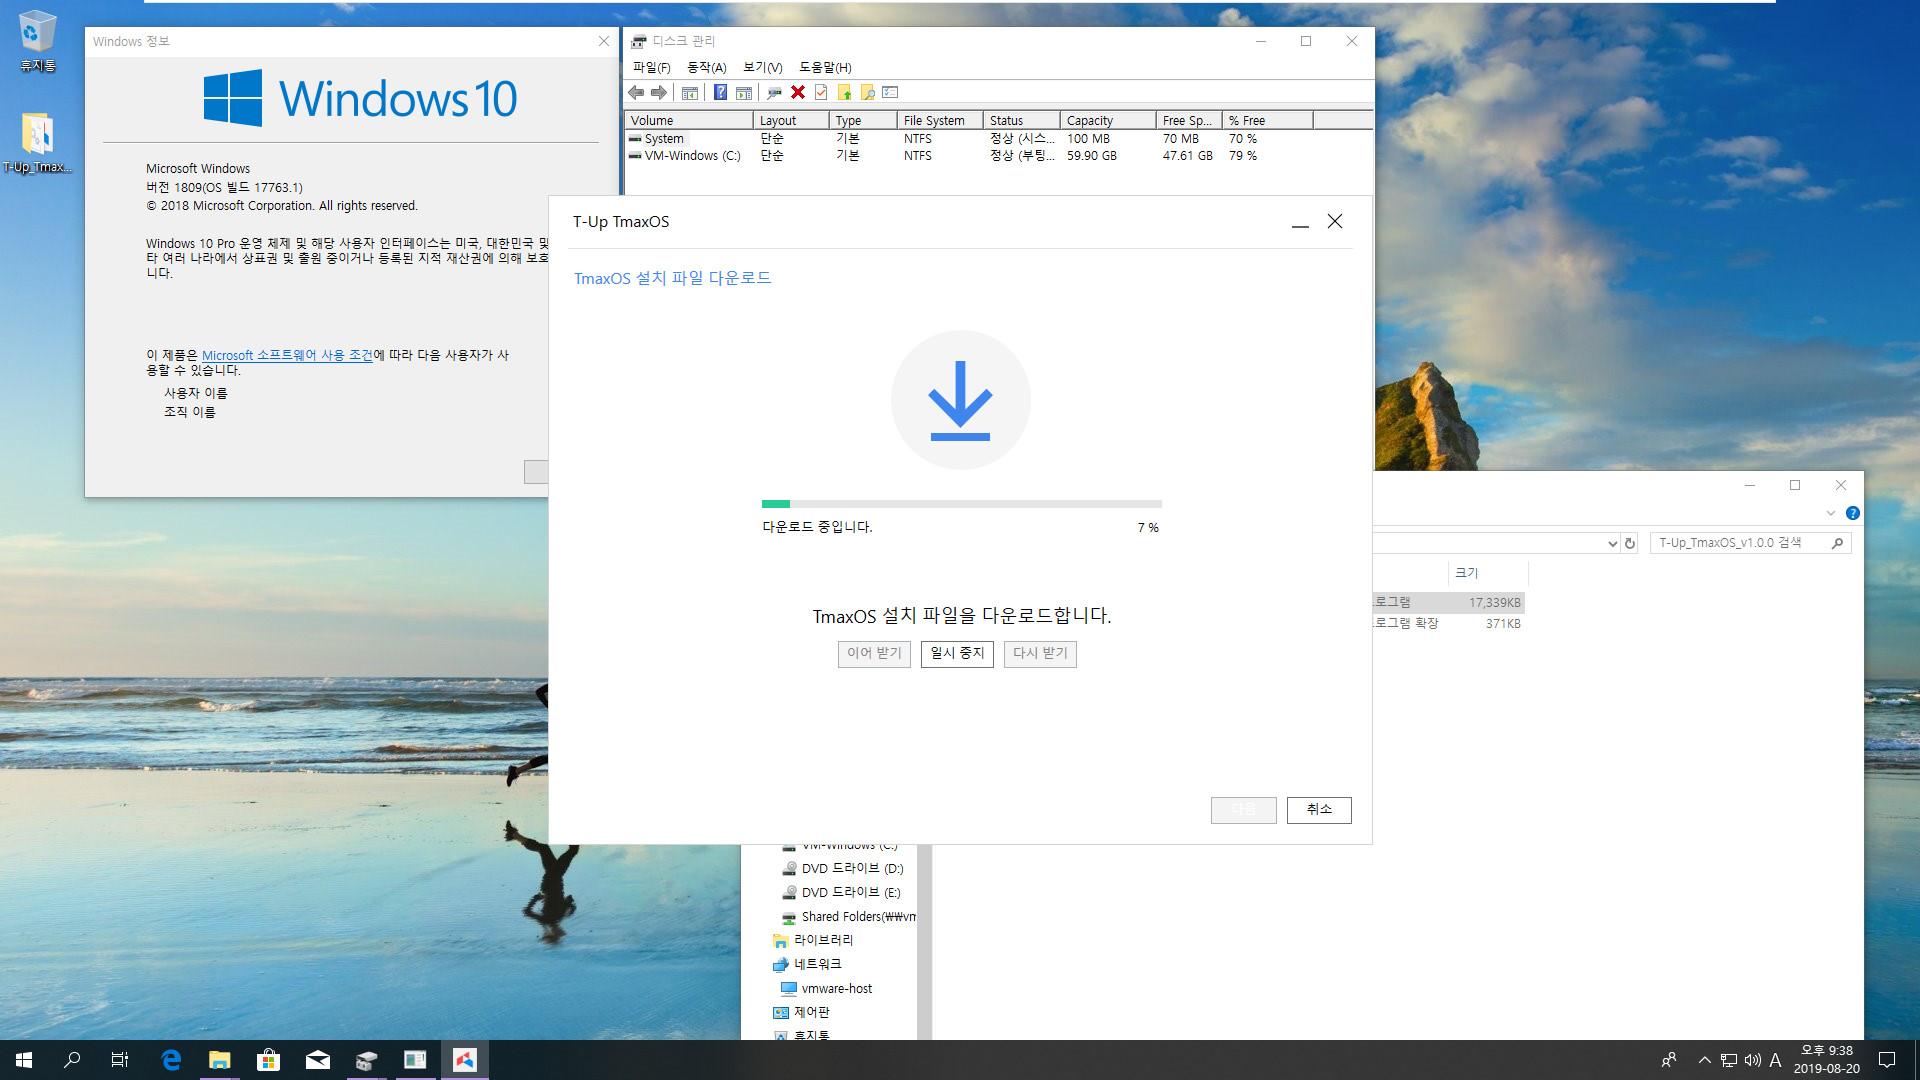 TmaxOS 설치 테스트 - 2번째 시도 - 이번에는 윈도에서 Tmax에서 제공한 T-Up TmaxOS.exe 으로 멀티 부팅으로 설치하기 2019-08-20_213841.jpg